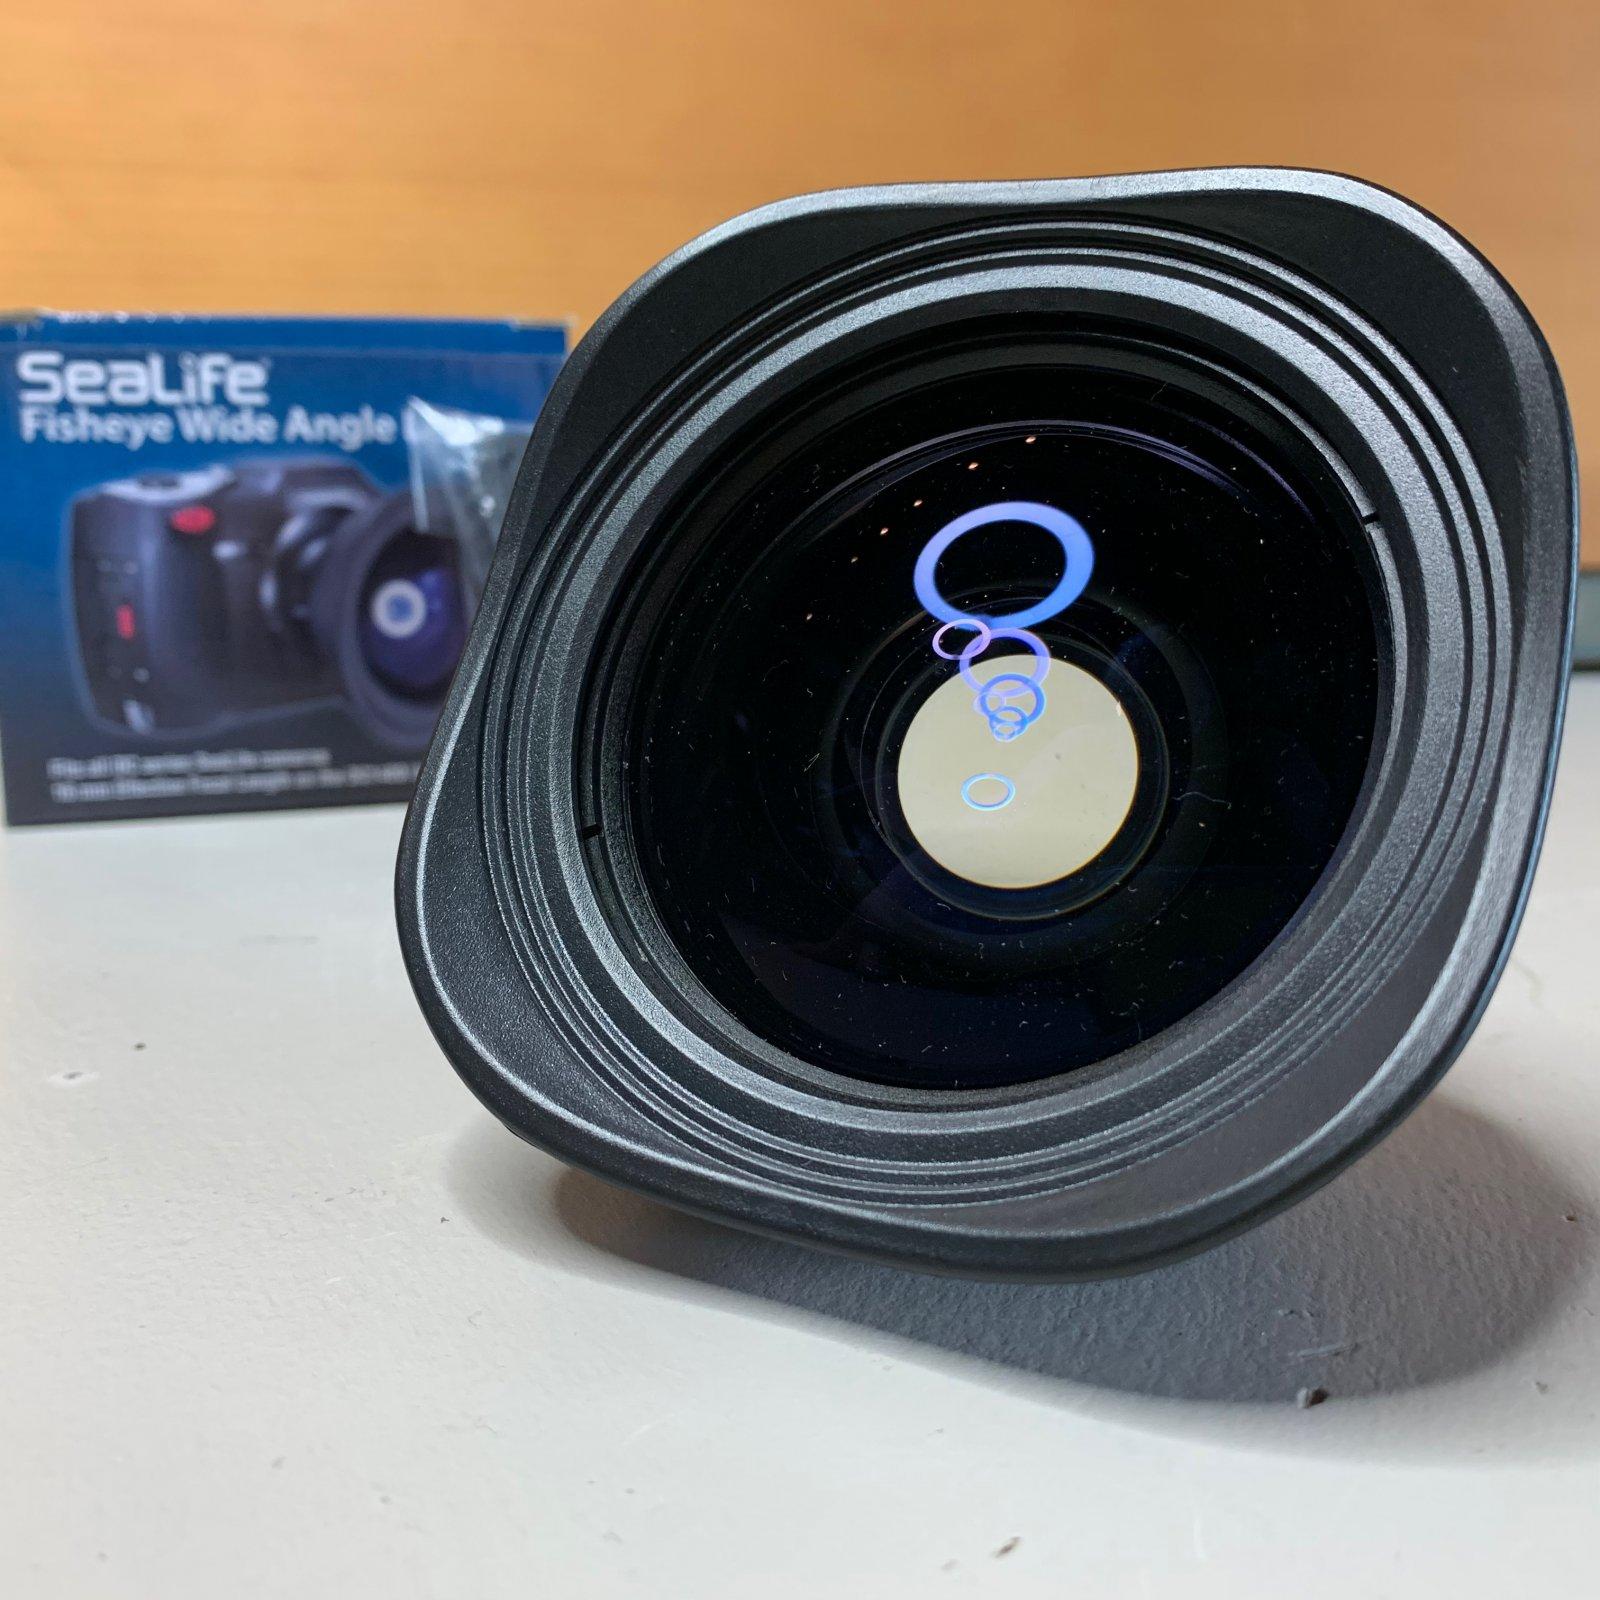 Fisheye Wide Angle Lens